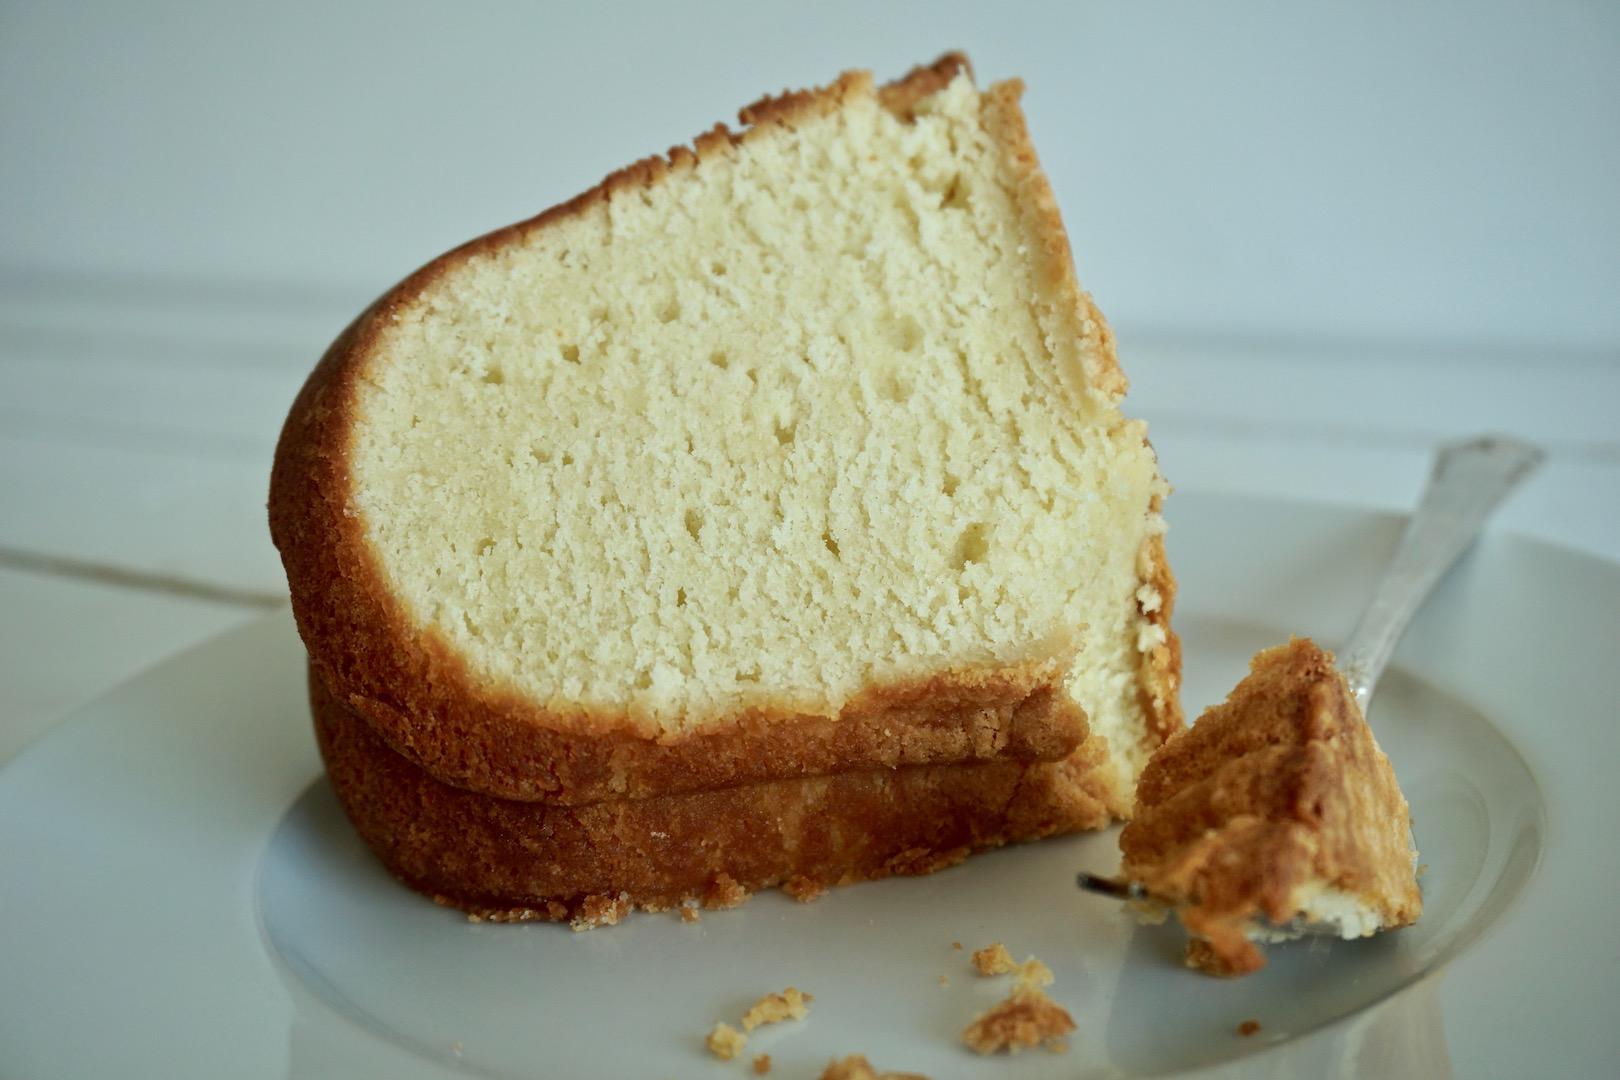 https://alabama-travel.s3.amazonaws.com/partners-uploads/photo/image/5b3bdf3e2051efdba0000085/bake_my_day_cream_cheese_pound_cake_2.jpg